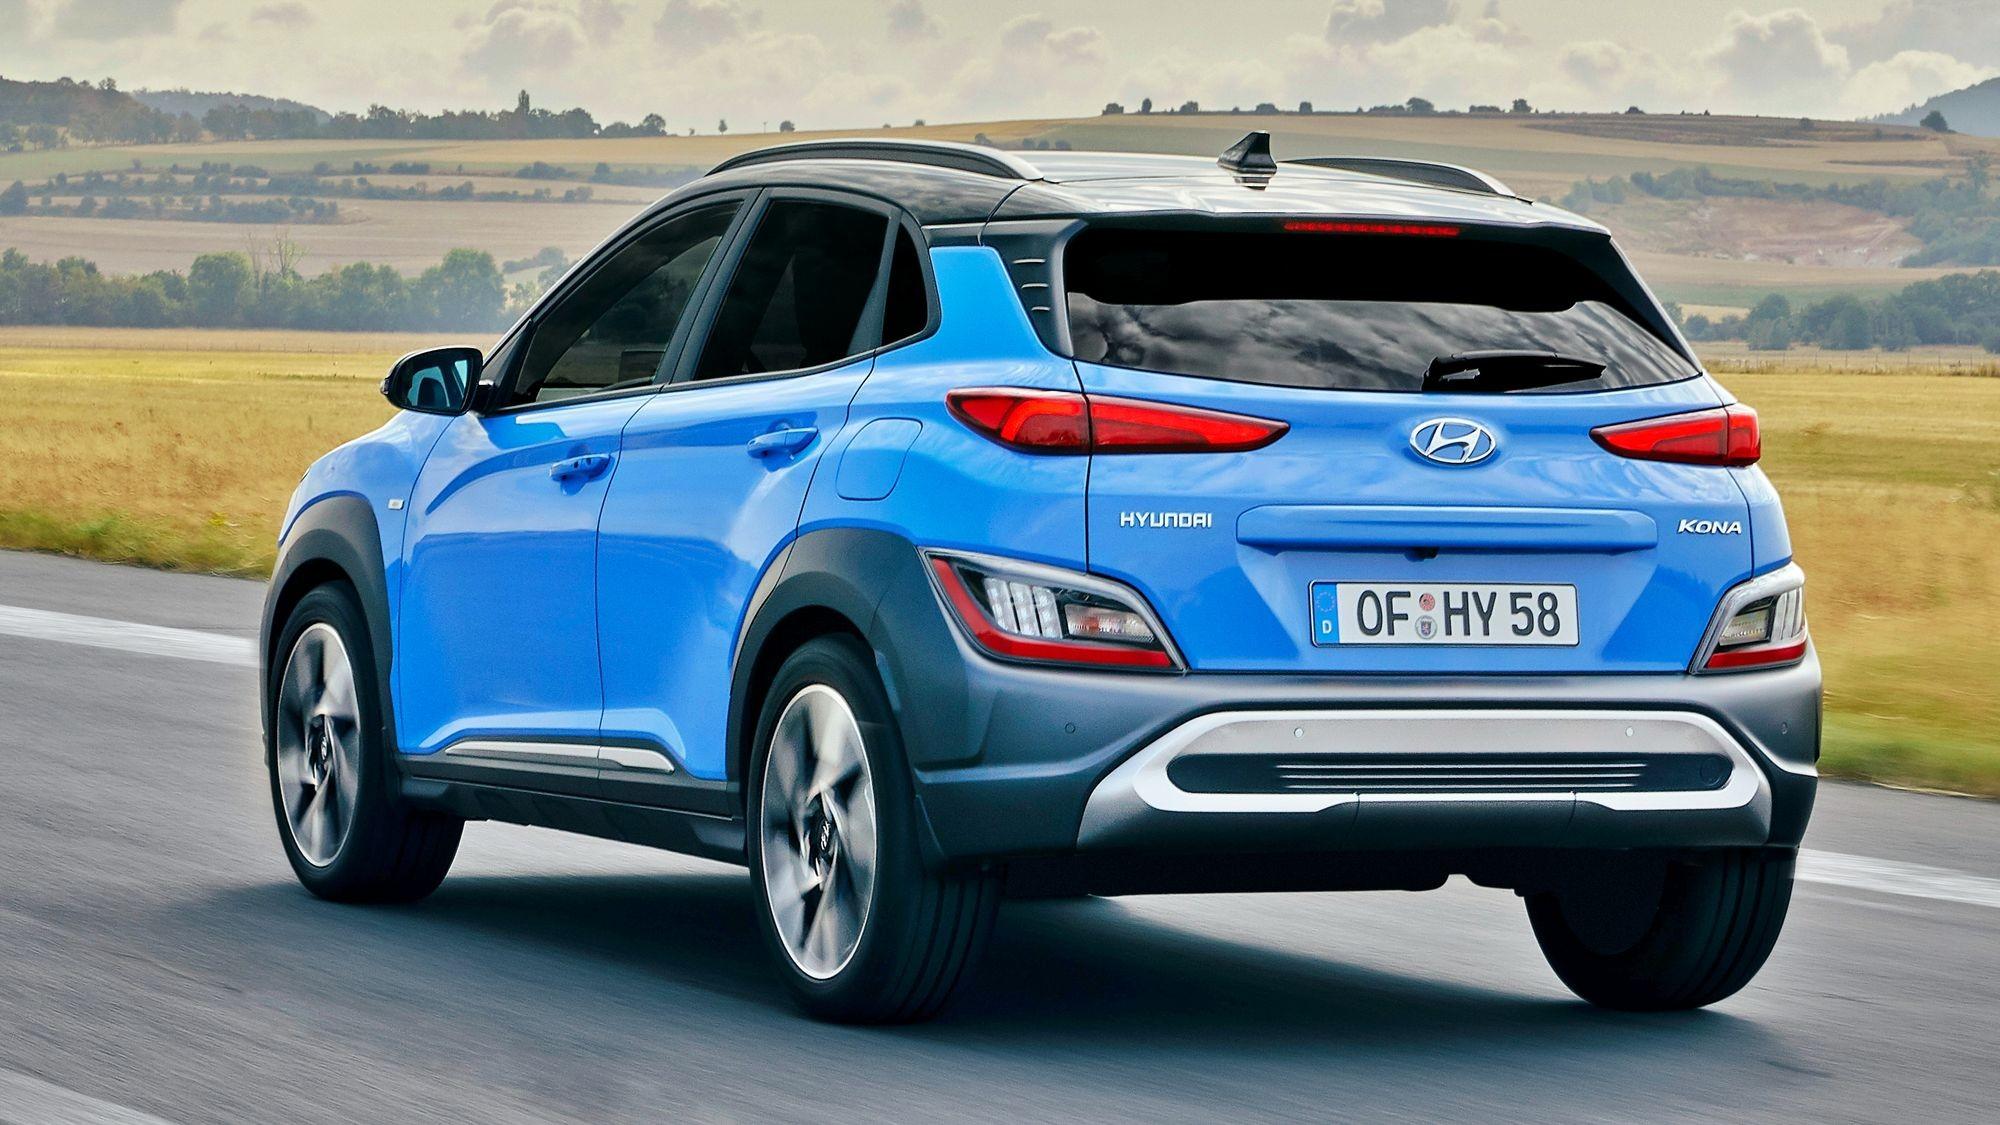 Обновлённая Hyundai Kona: МКП с автоматически сцеплением и версия N Line